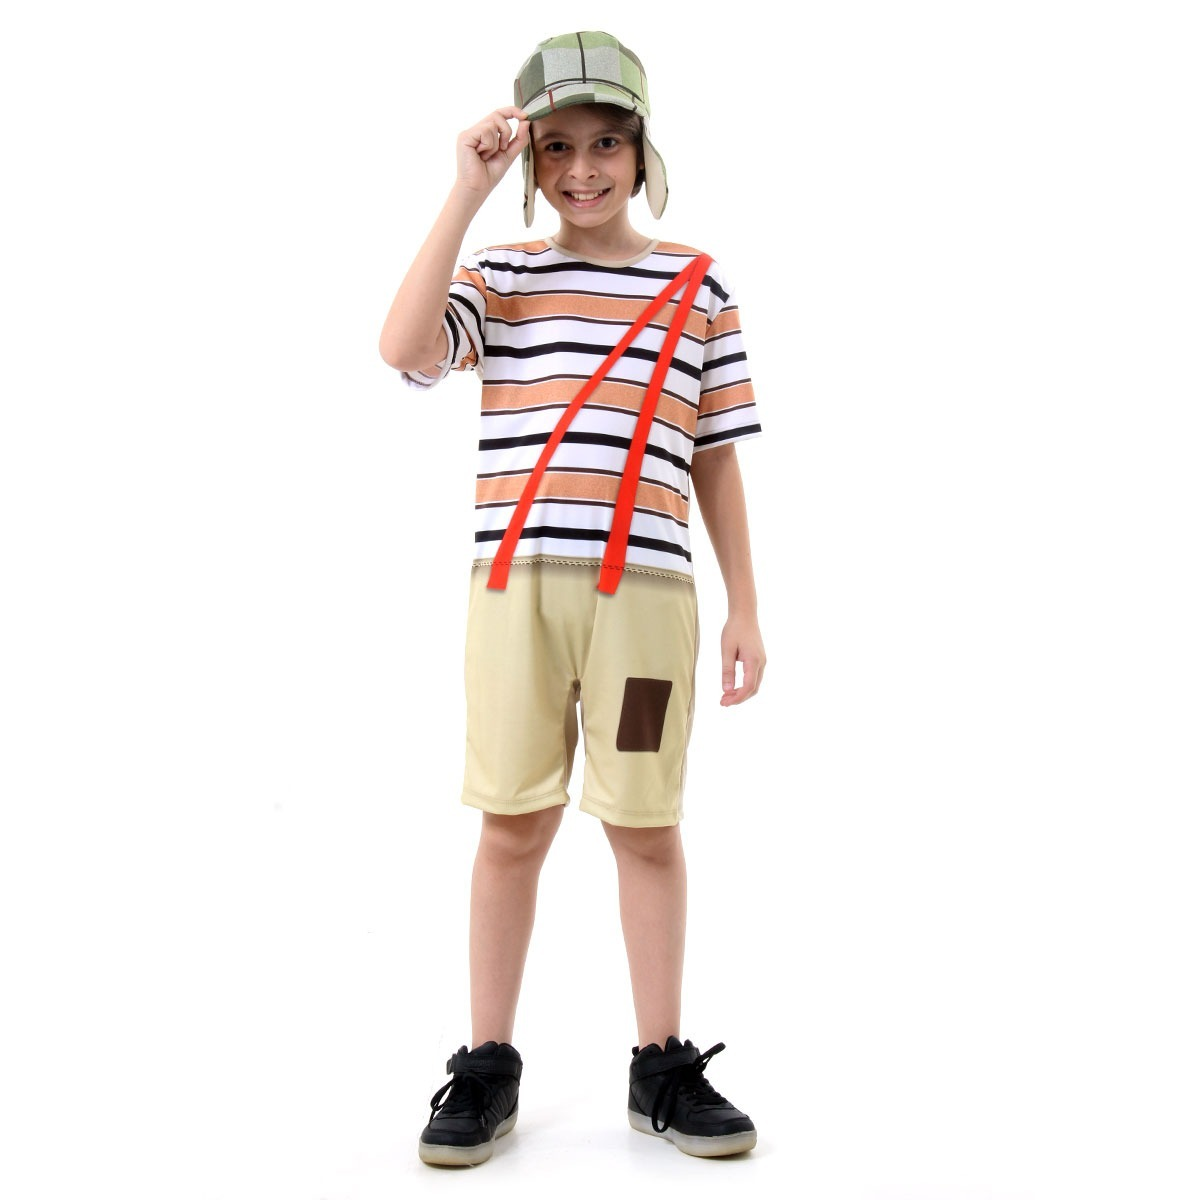 5f56b3ef3 Fantasia Chaves Infantil Curto P M G - R$ 119,49 em Mercado Livre